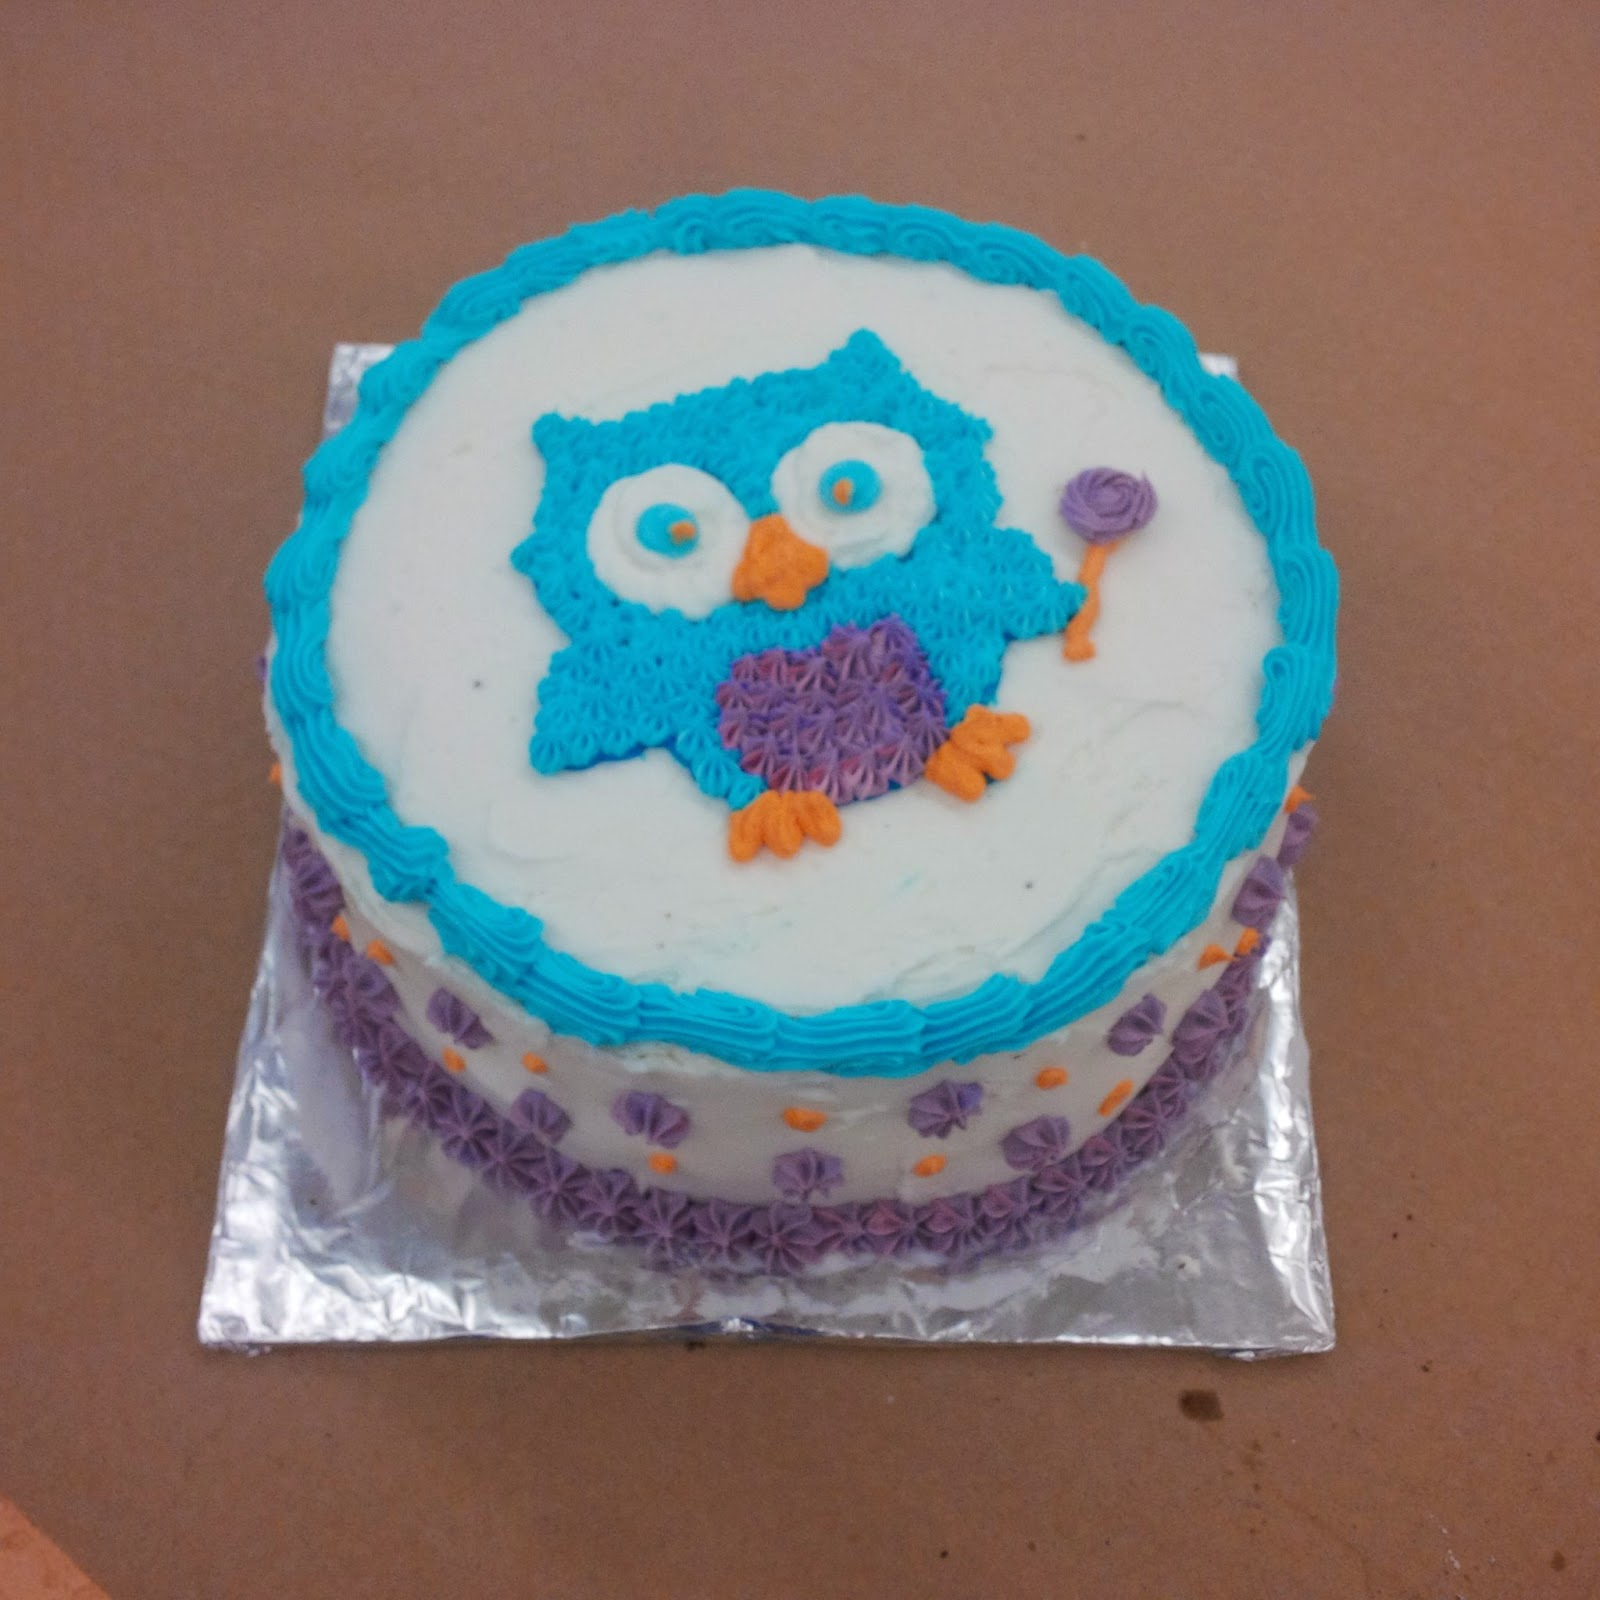 Cake Decorating Michaels Waterbury Ct : My life out of a lab coat: Cake Decorating at Michaels ...